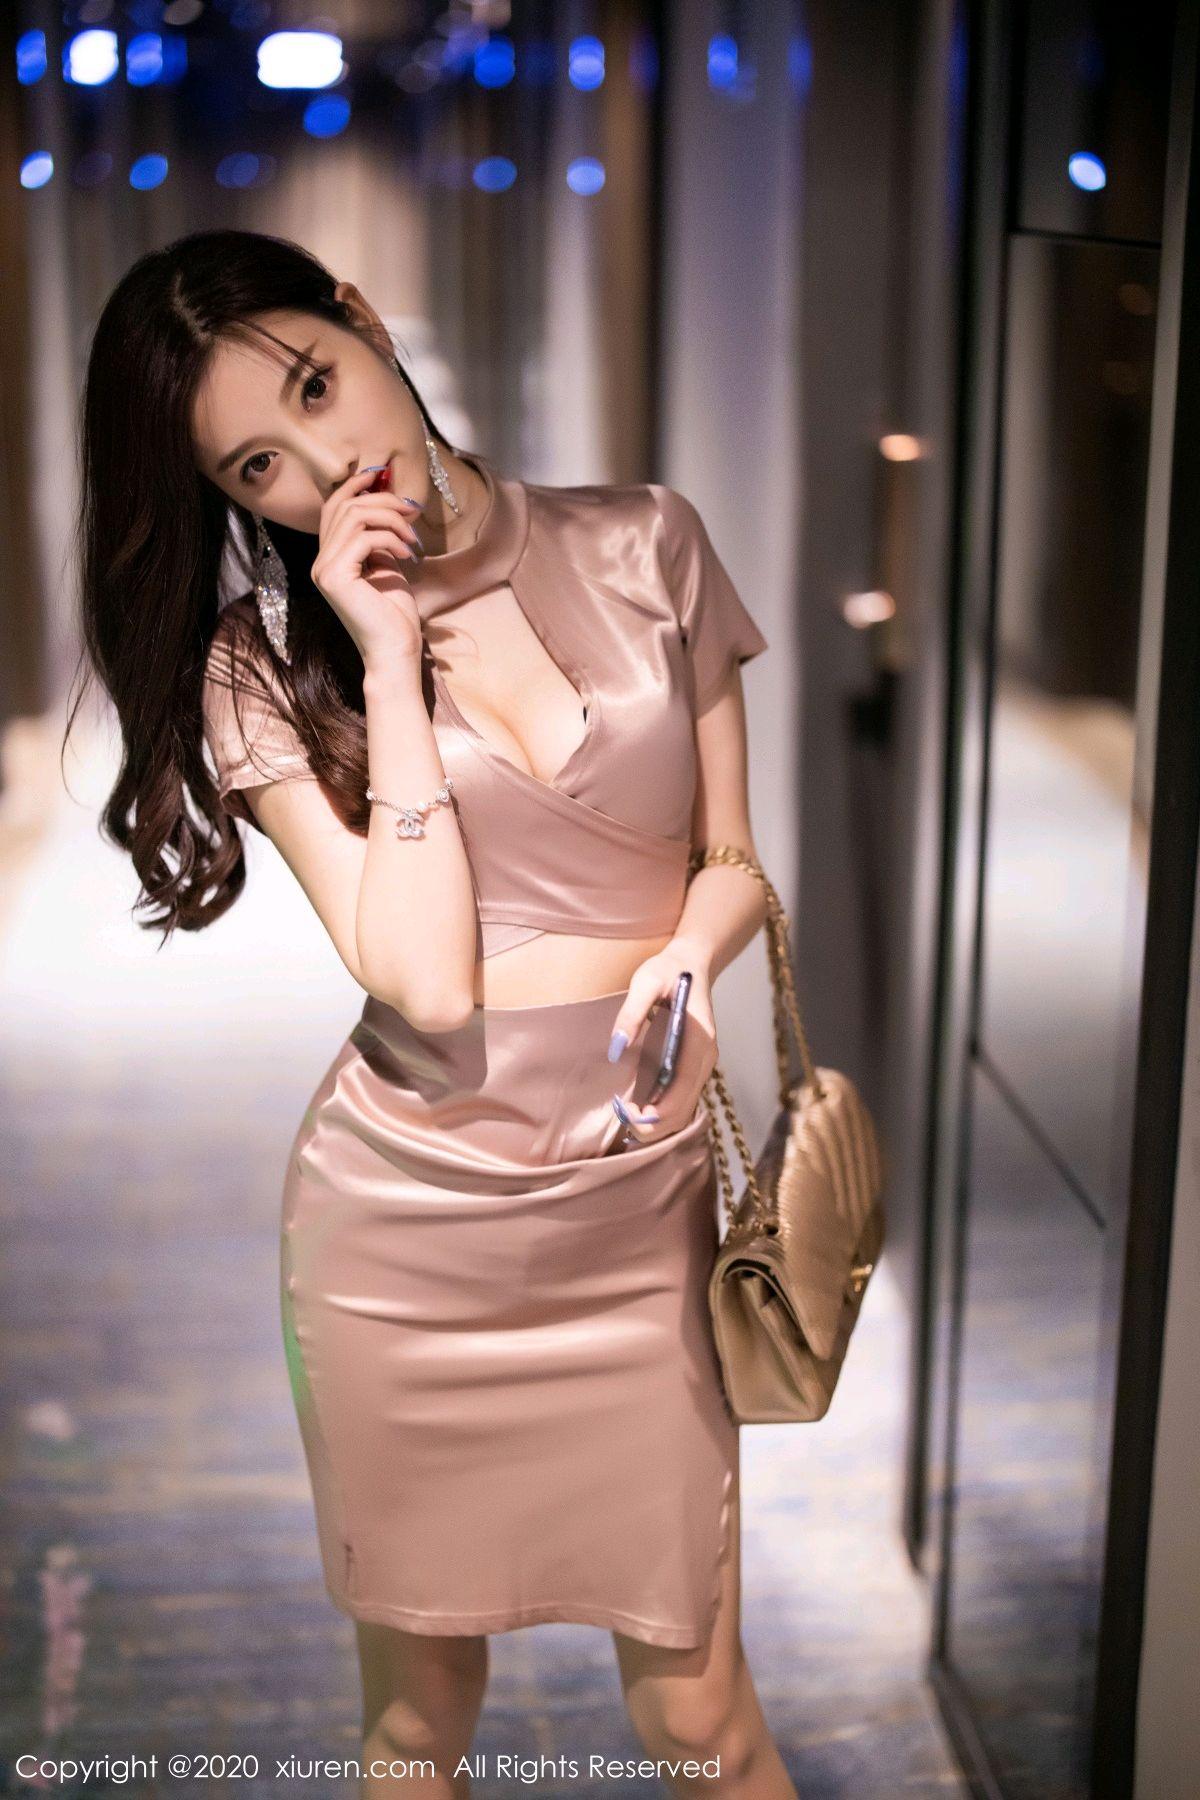 [XiuRen] Vol.2587 Yang Chen Chen 23P, Underwear, Xiuren, Yang Chen Chen